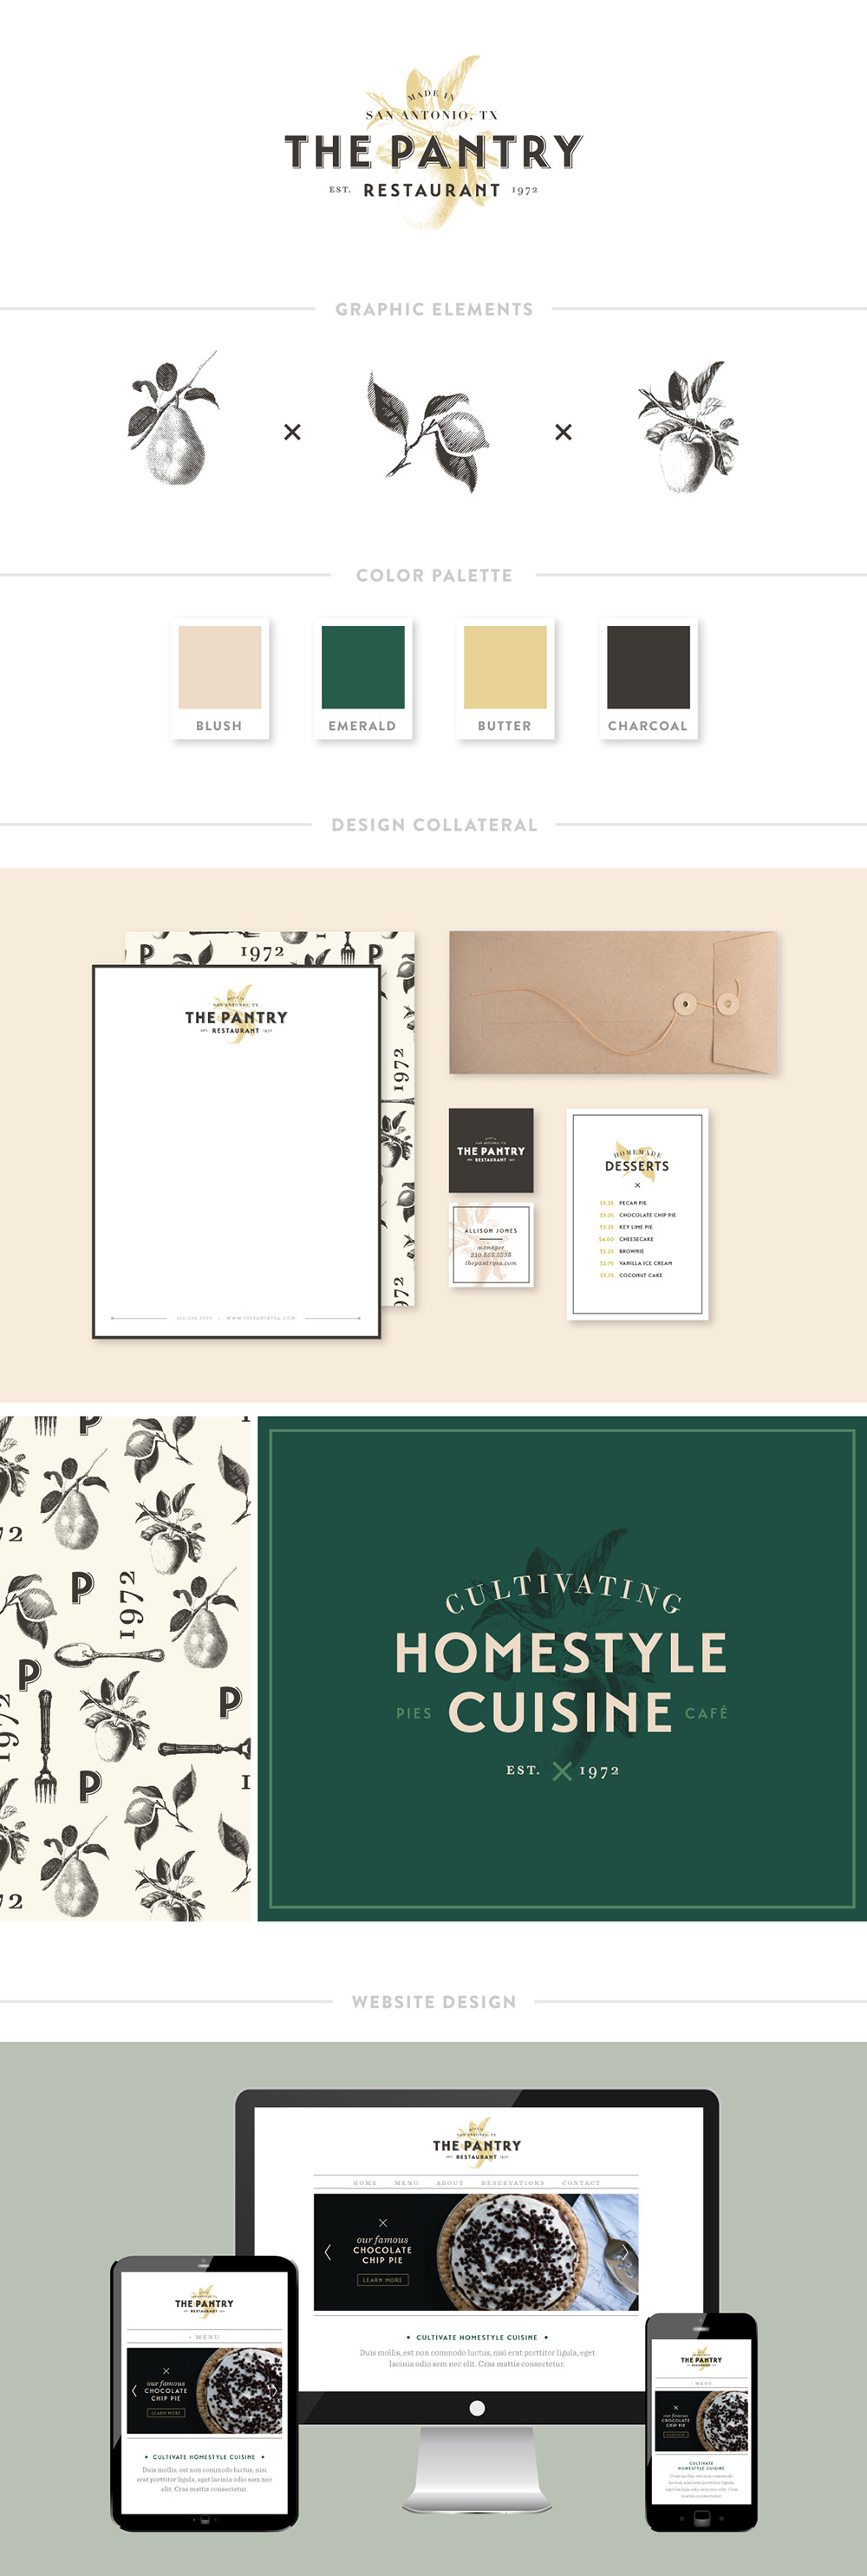 Portfolio The Pantry Branding Spruce Rd